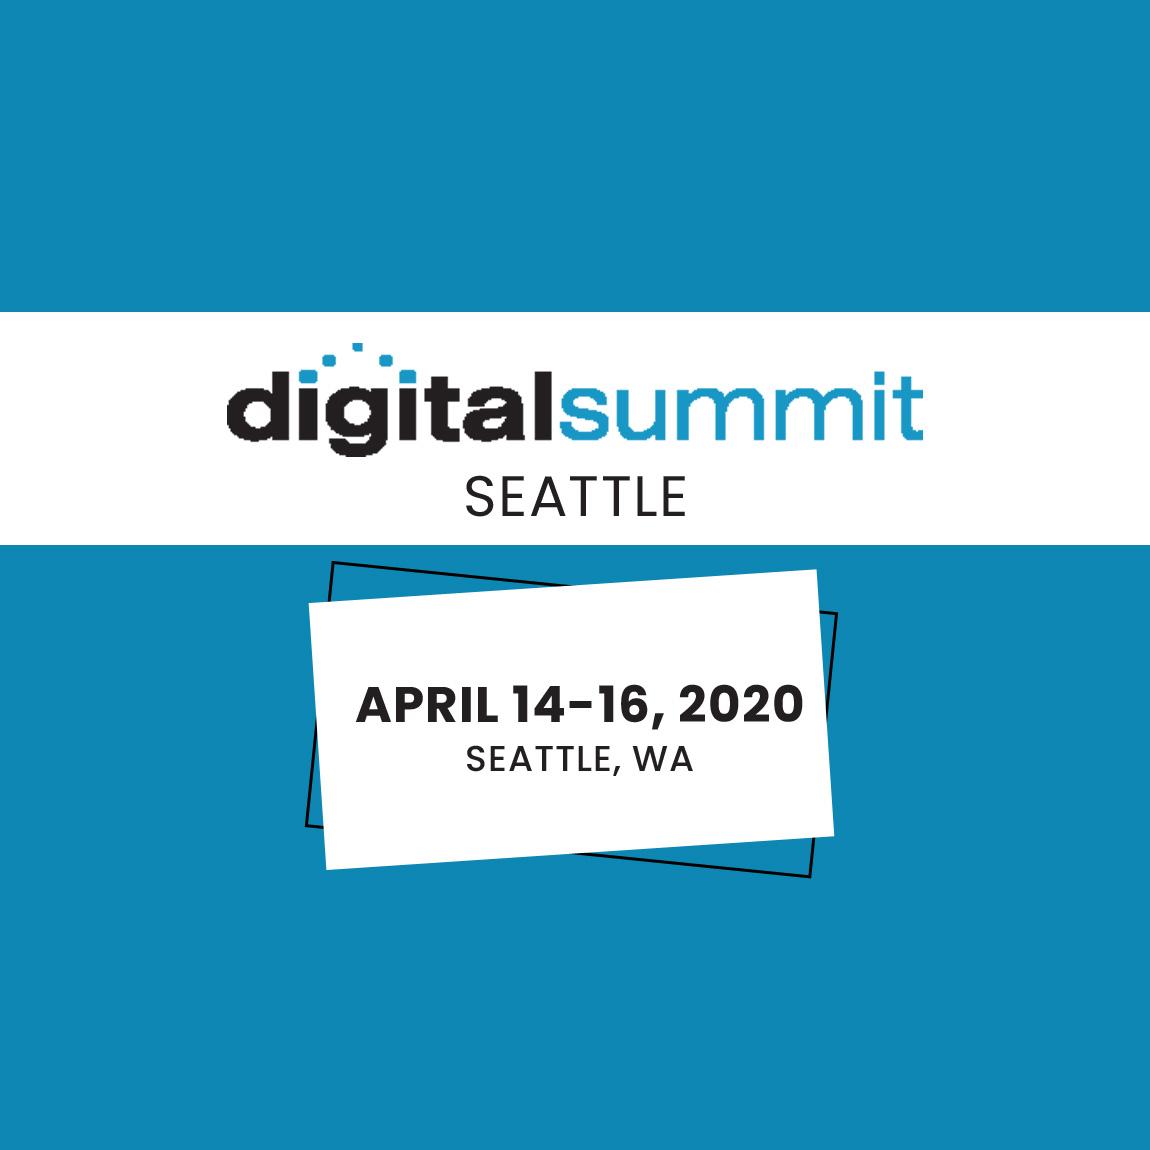 Digital Summit Seattle